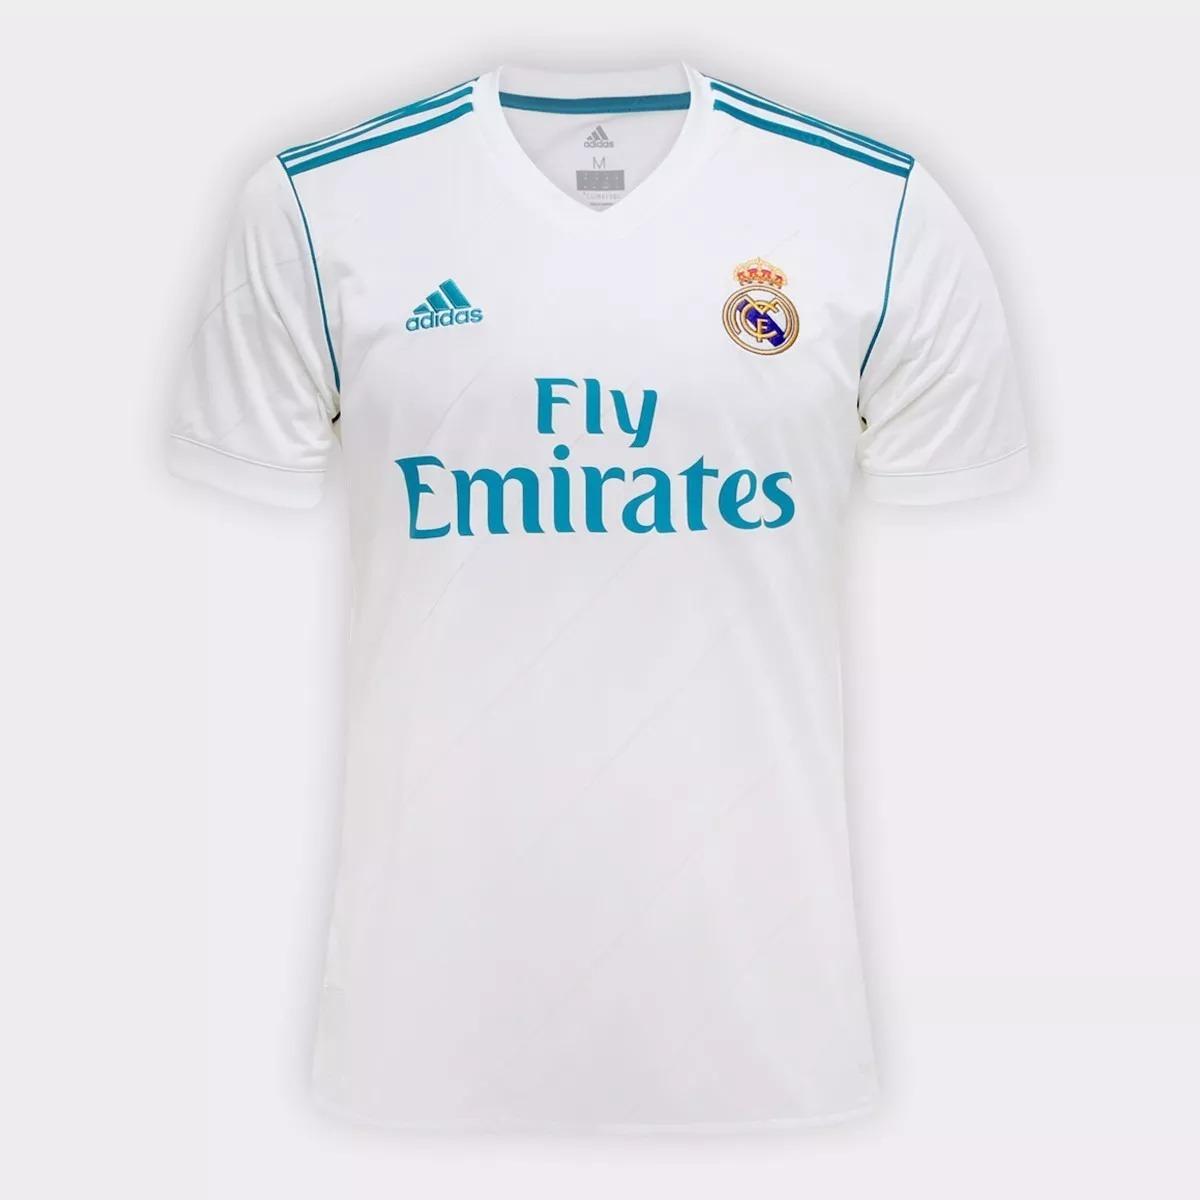 5506badc9 camiseta real madrid champions uniforme oficial 2018. Carregando zoom.